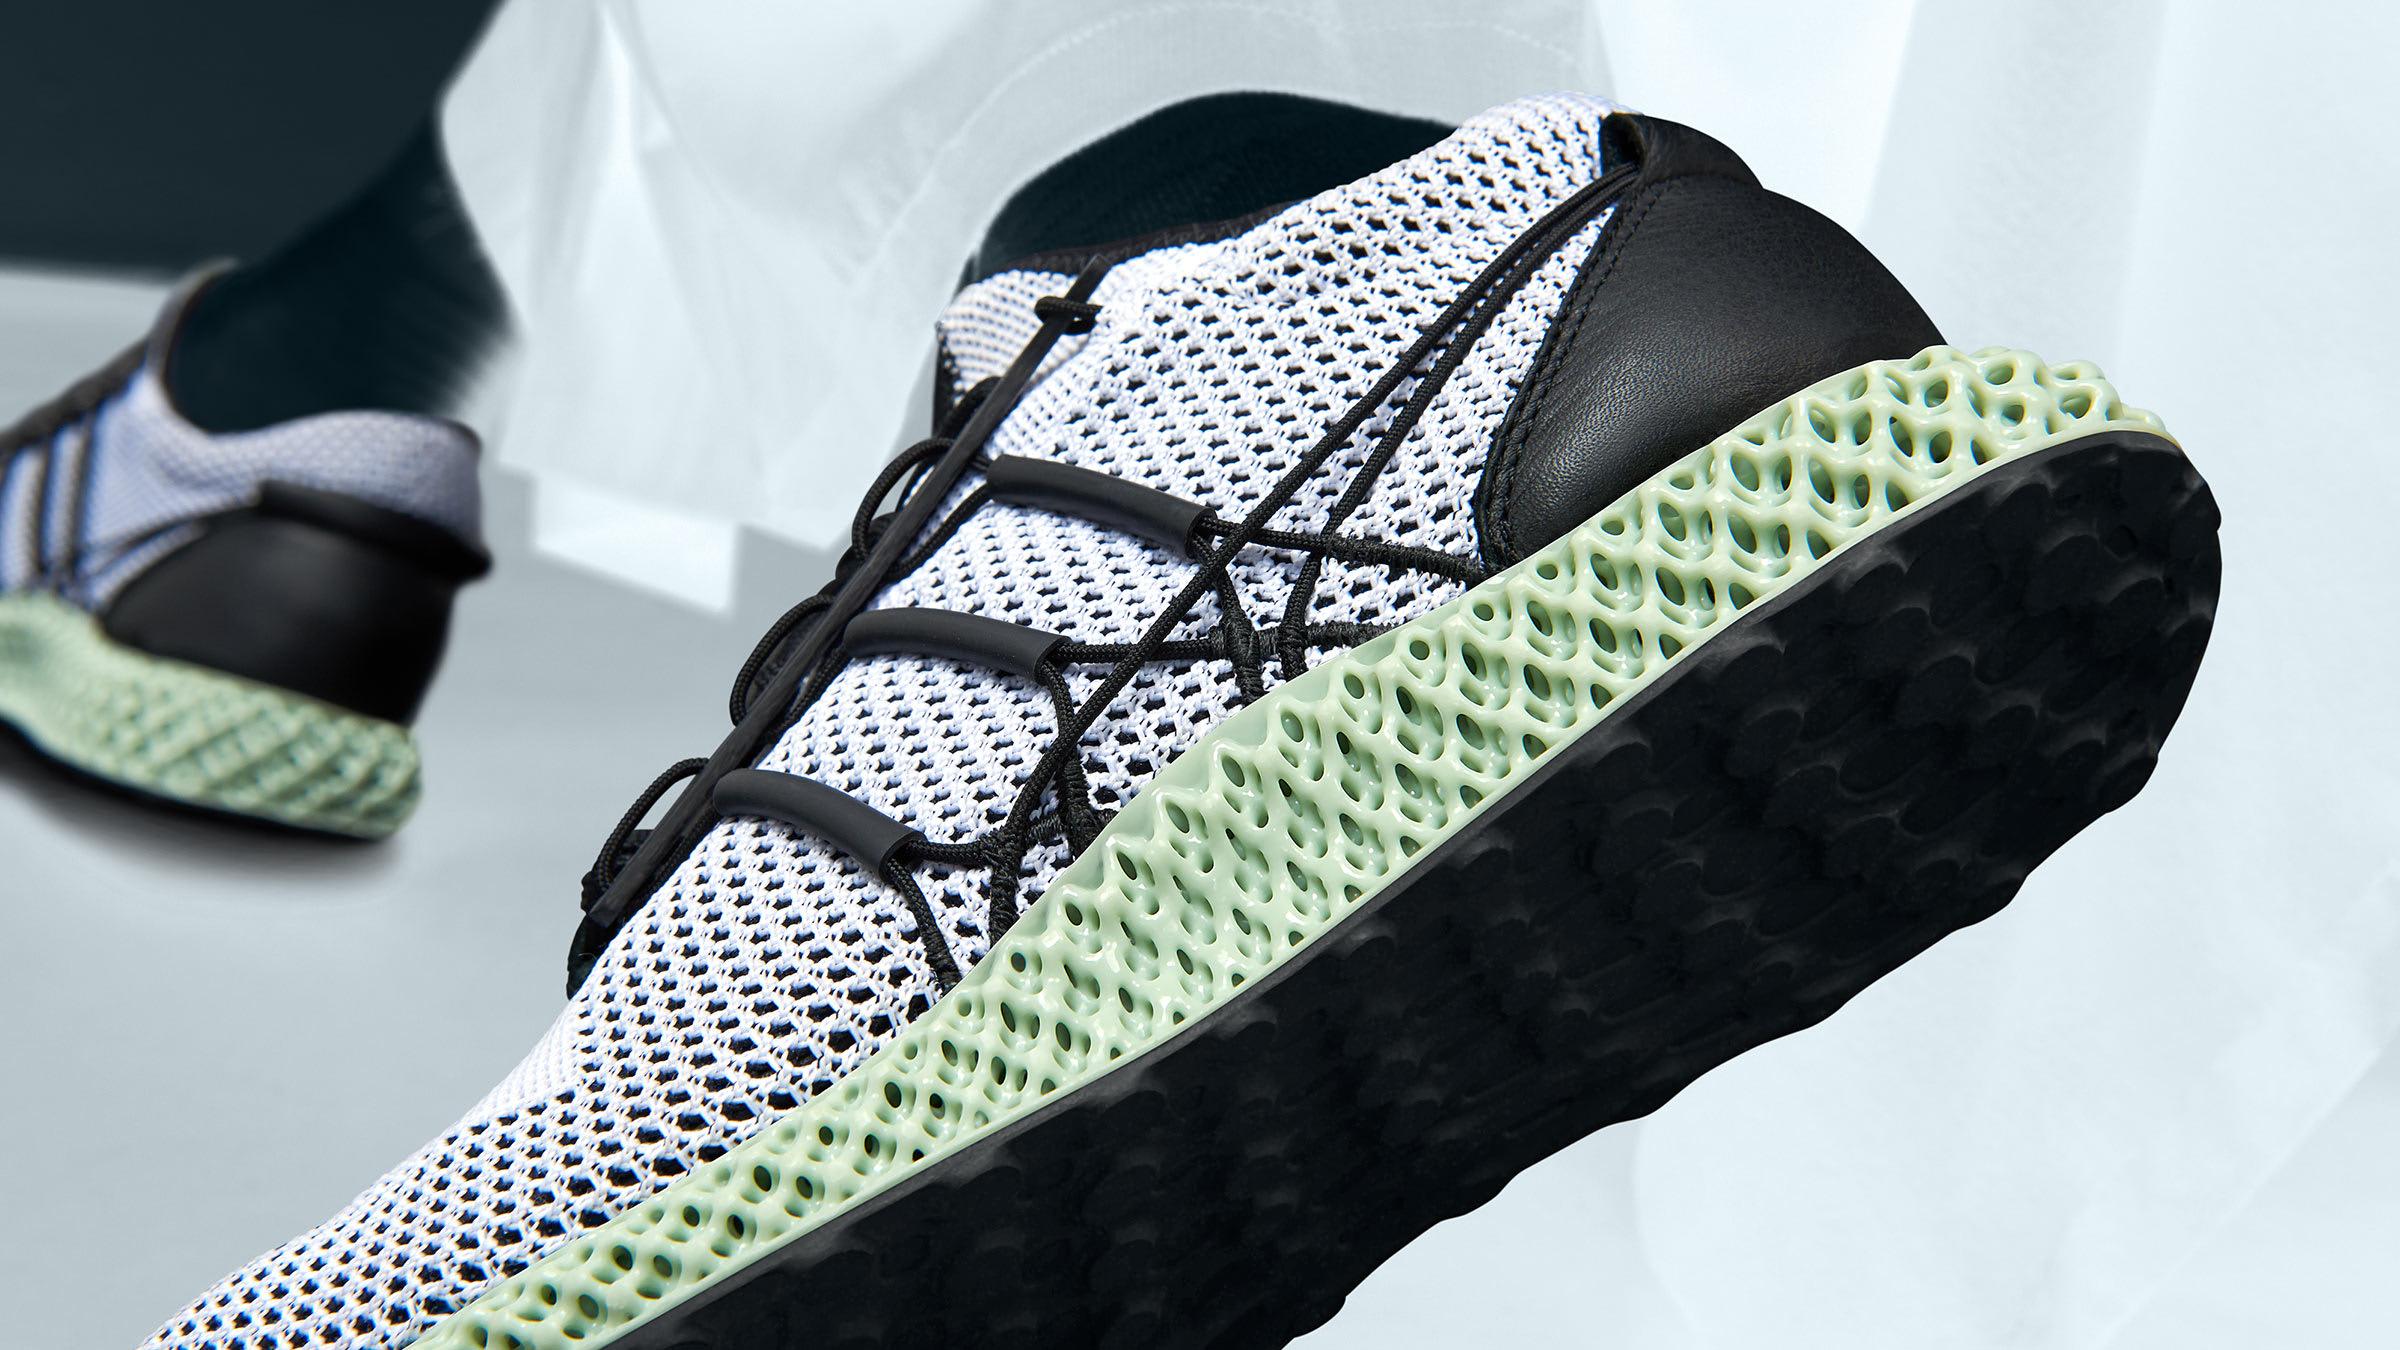 Adidas Y-3 Runner 4D AQ0357 4